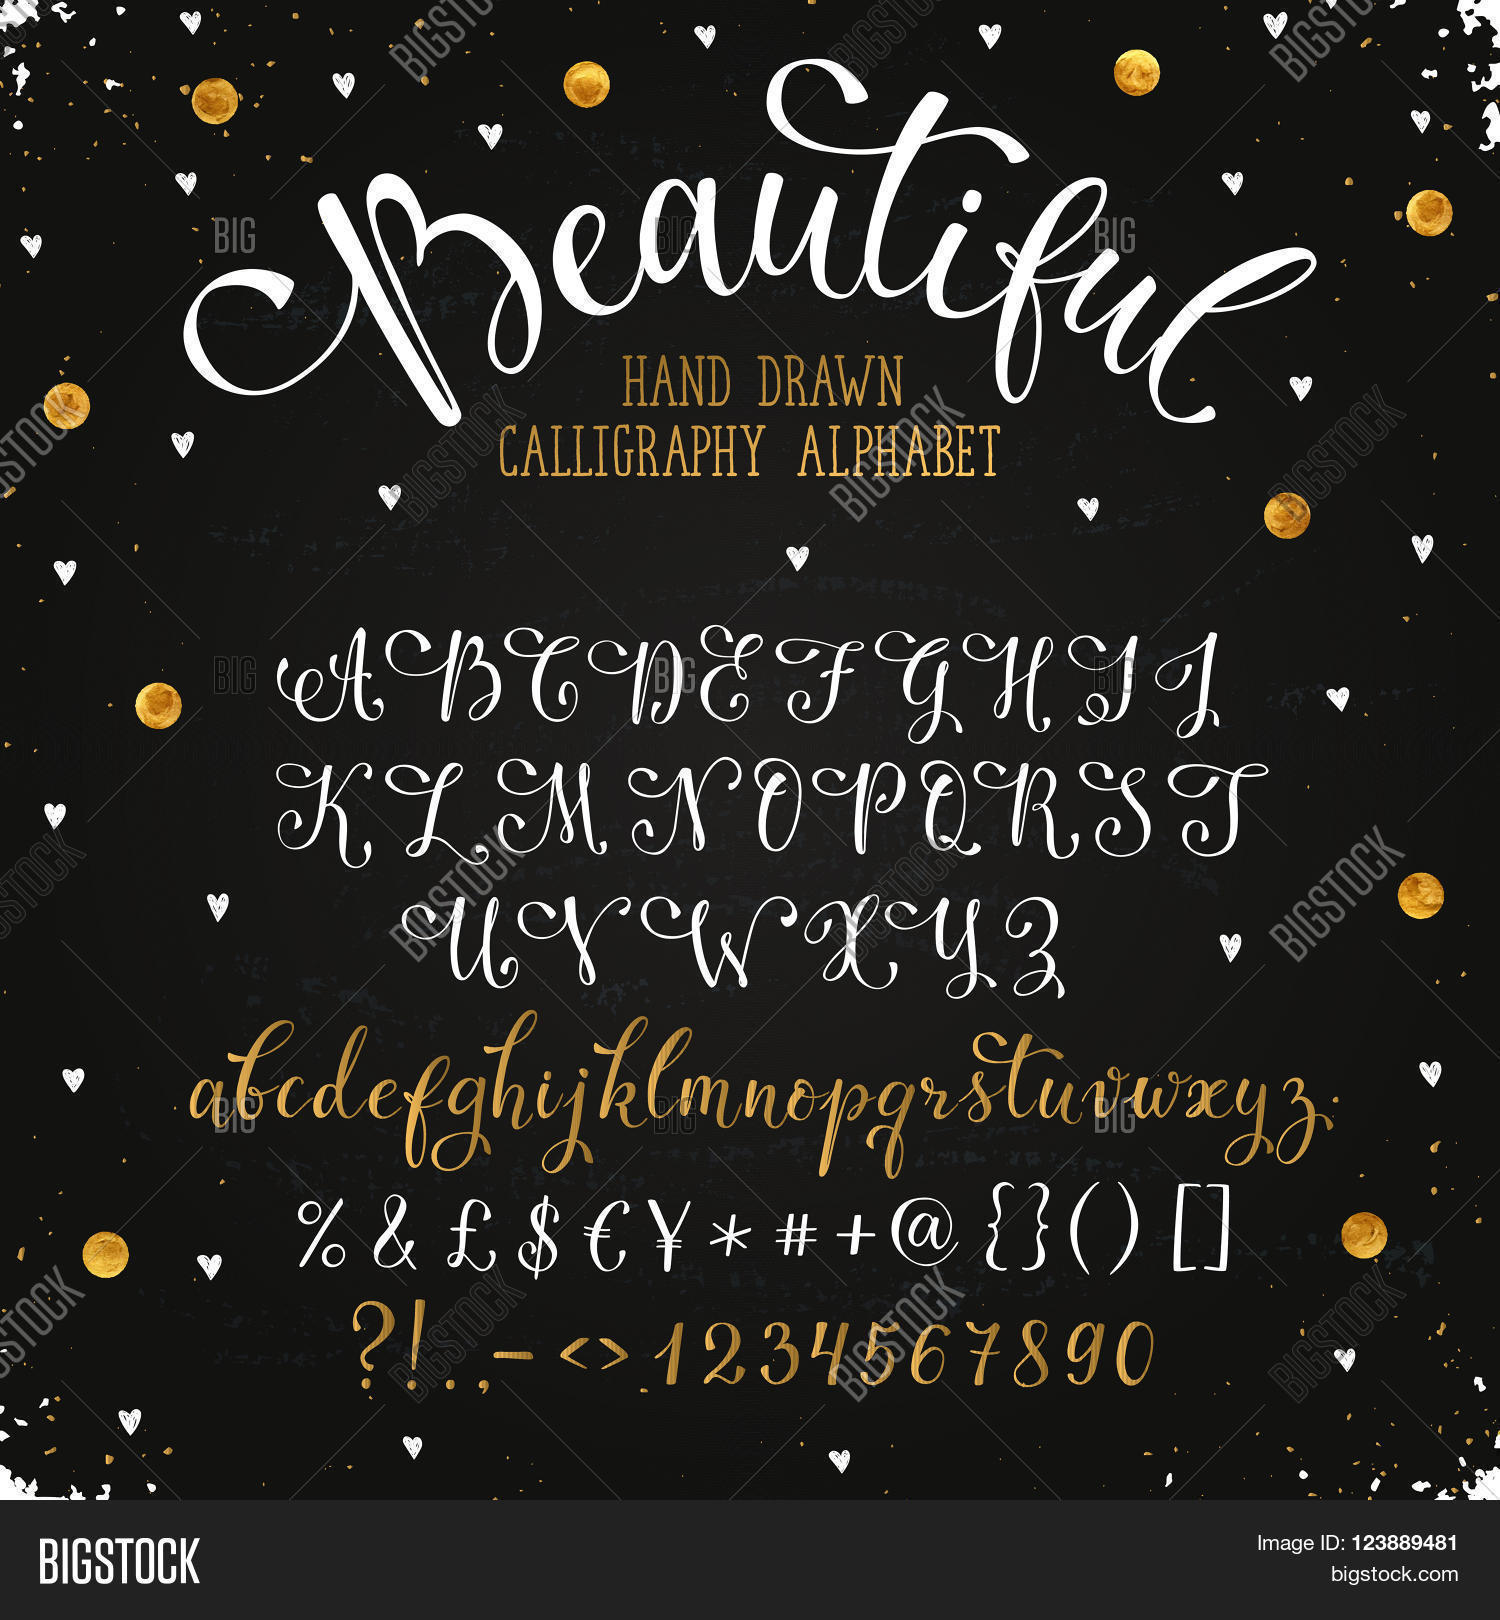 Elegant Calligraphy Vector Photo Free Trial Bigstock